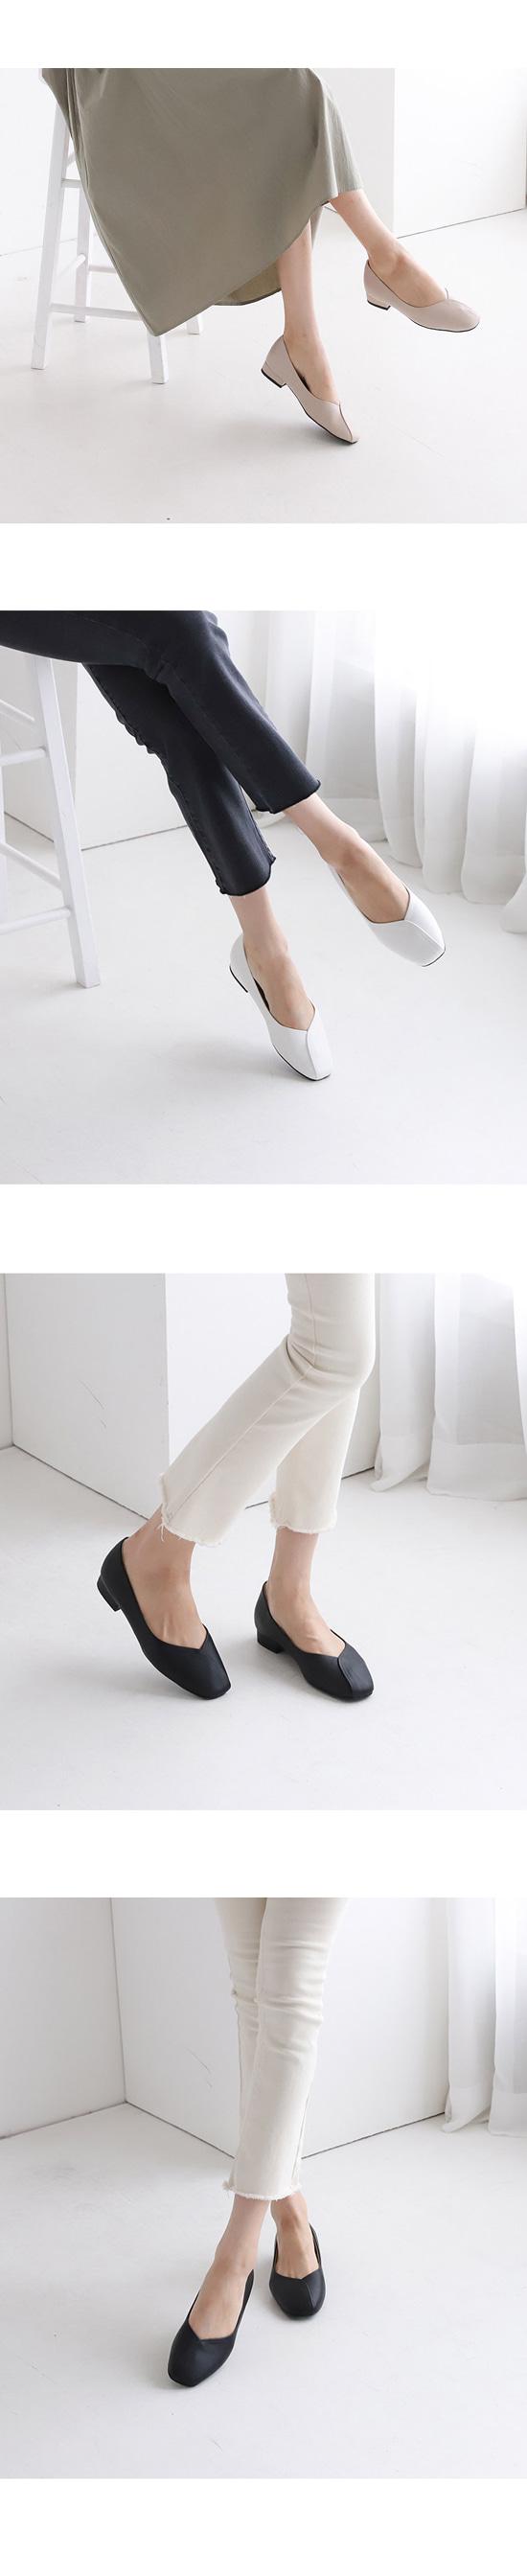 Square Toe Low Heel Flat Pumps White